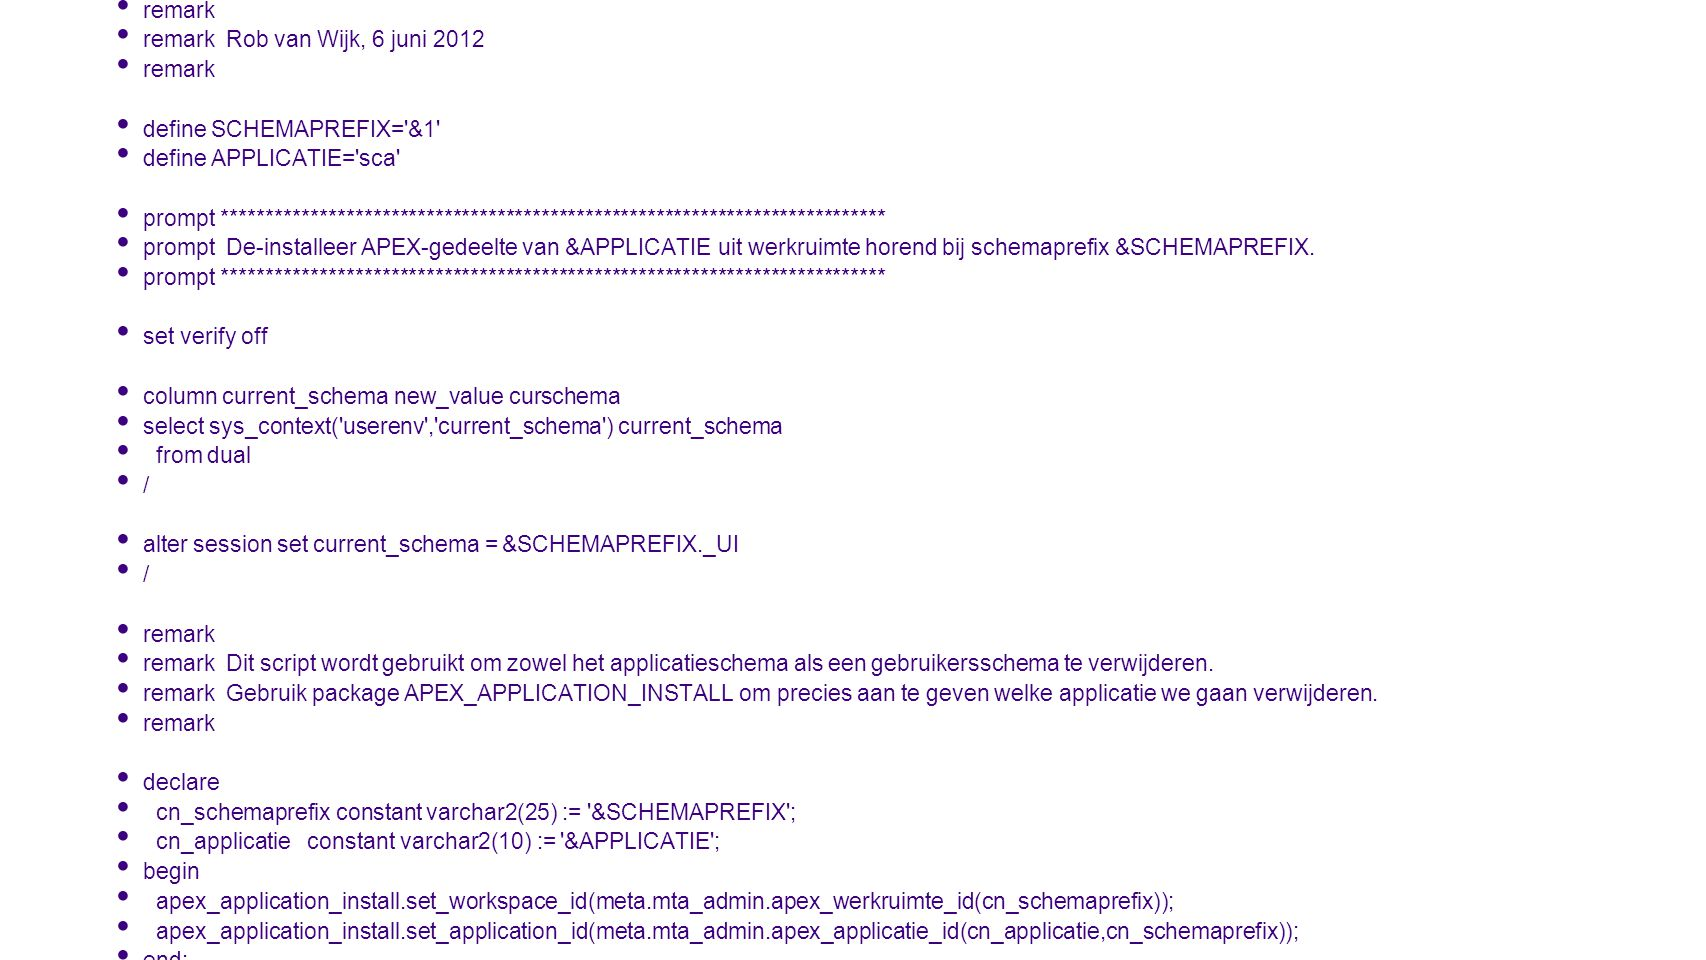 remark remark uninstall_apex.sql. remark Rob van Wijk, 6 juni 2012. define SCHEMAPREFIX= &1 define APPLICATIE= sca